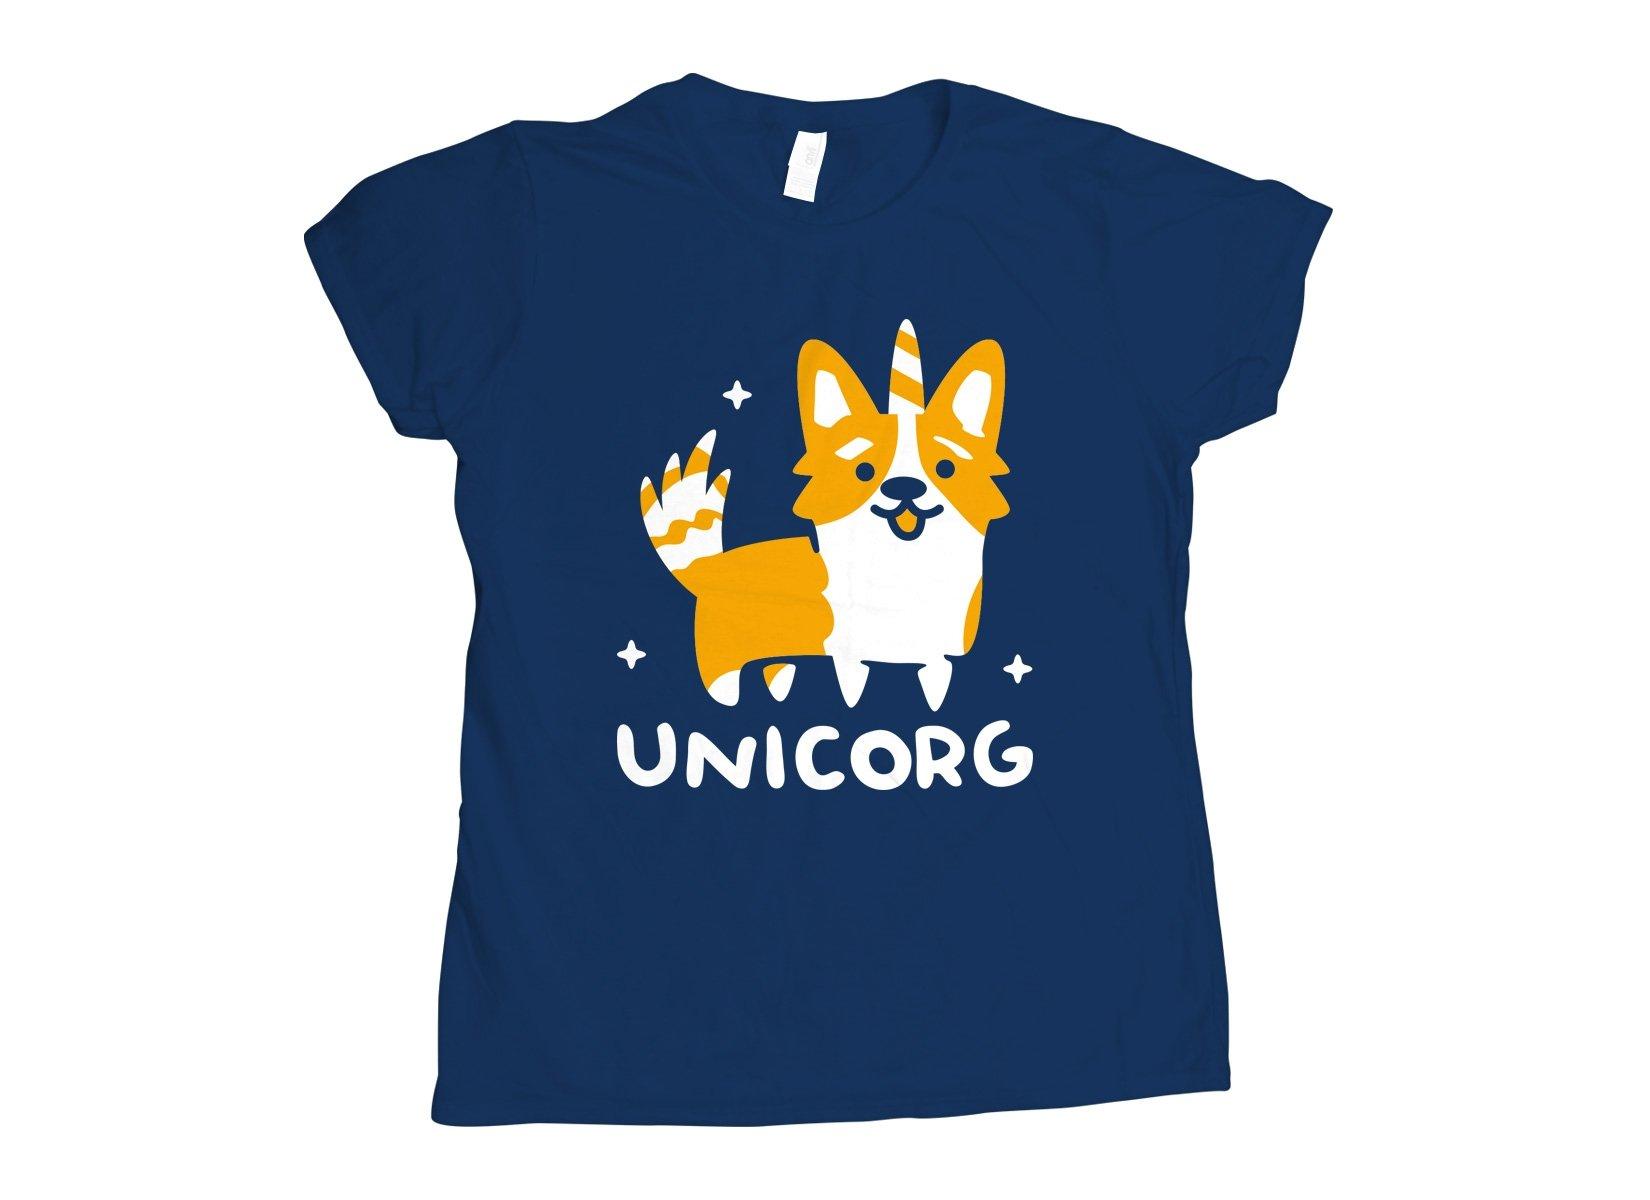 Unicorg on Womens T-Shirt